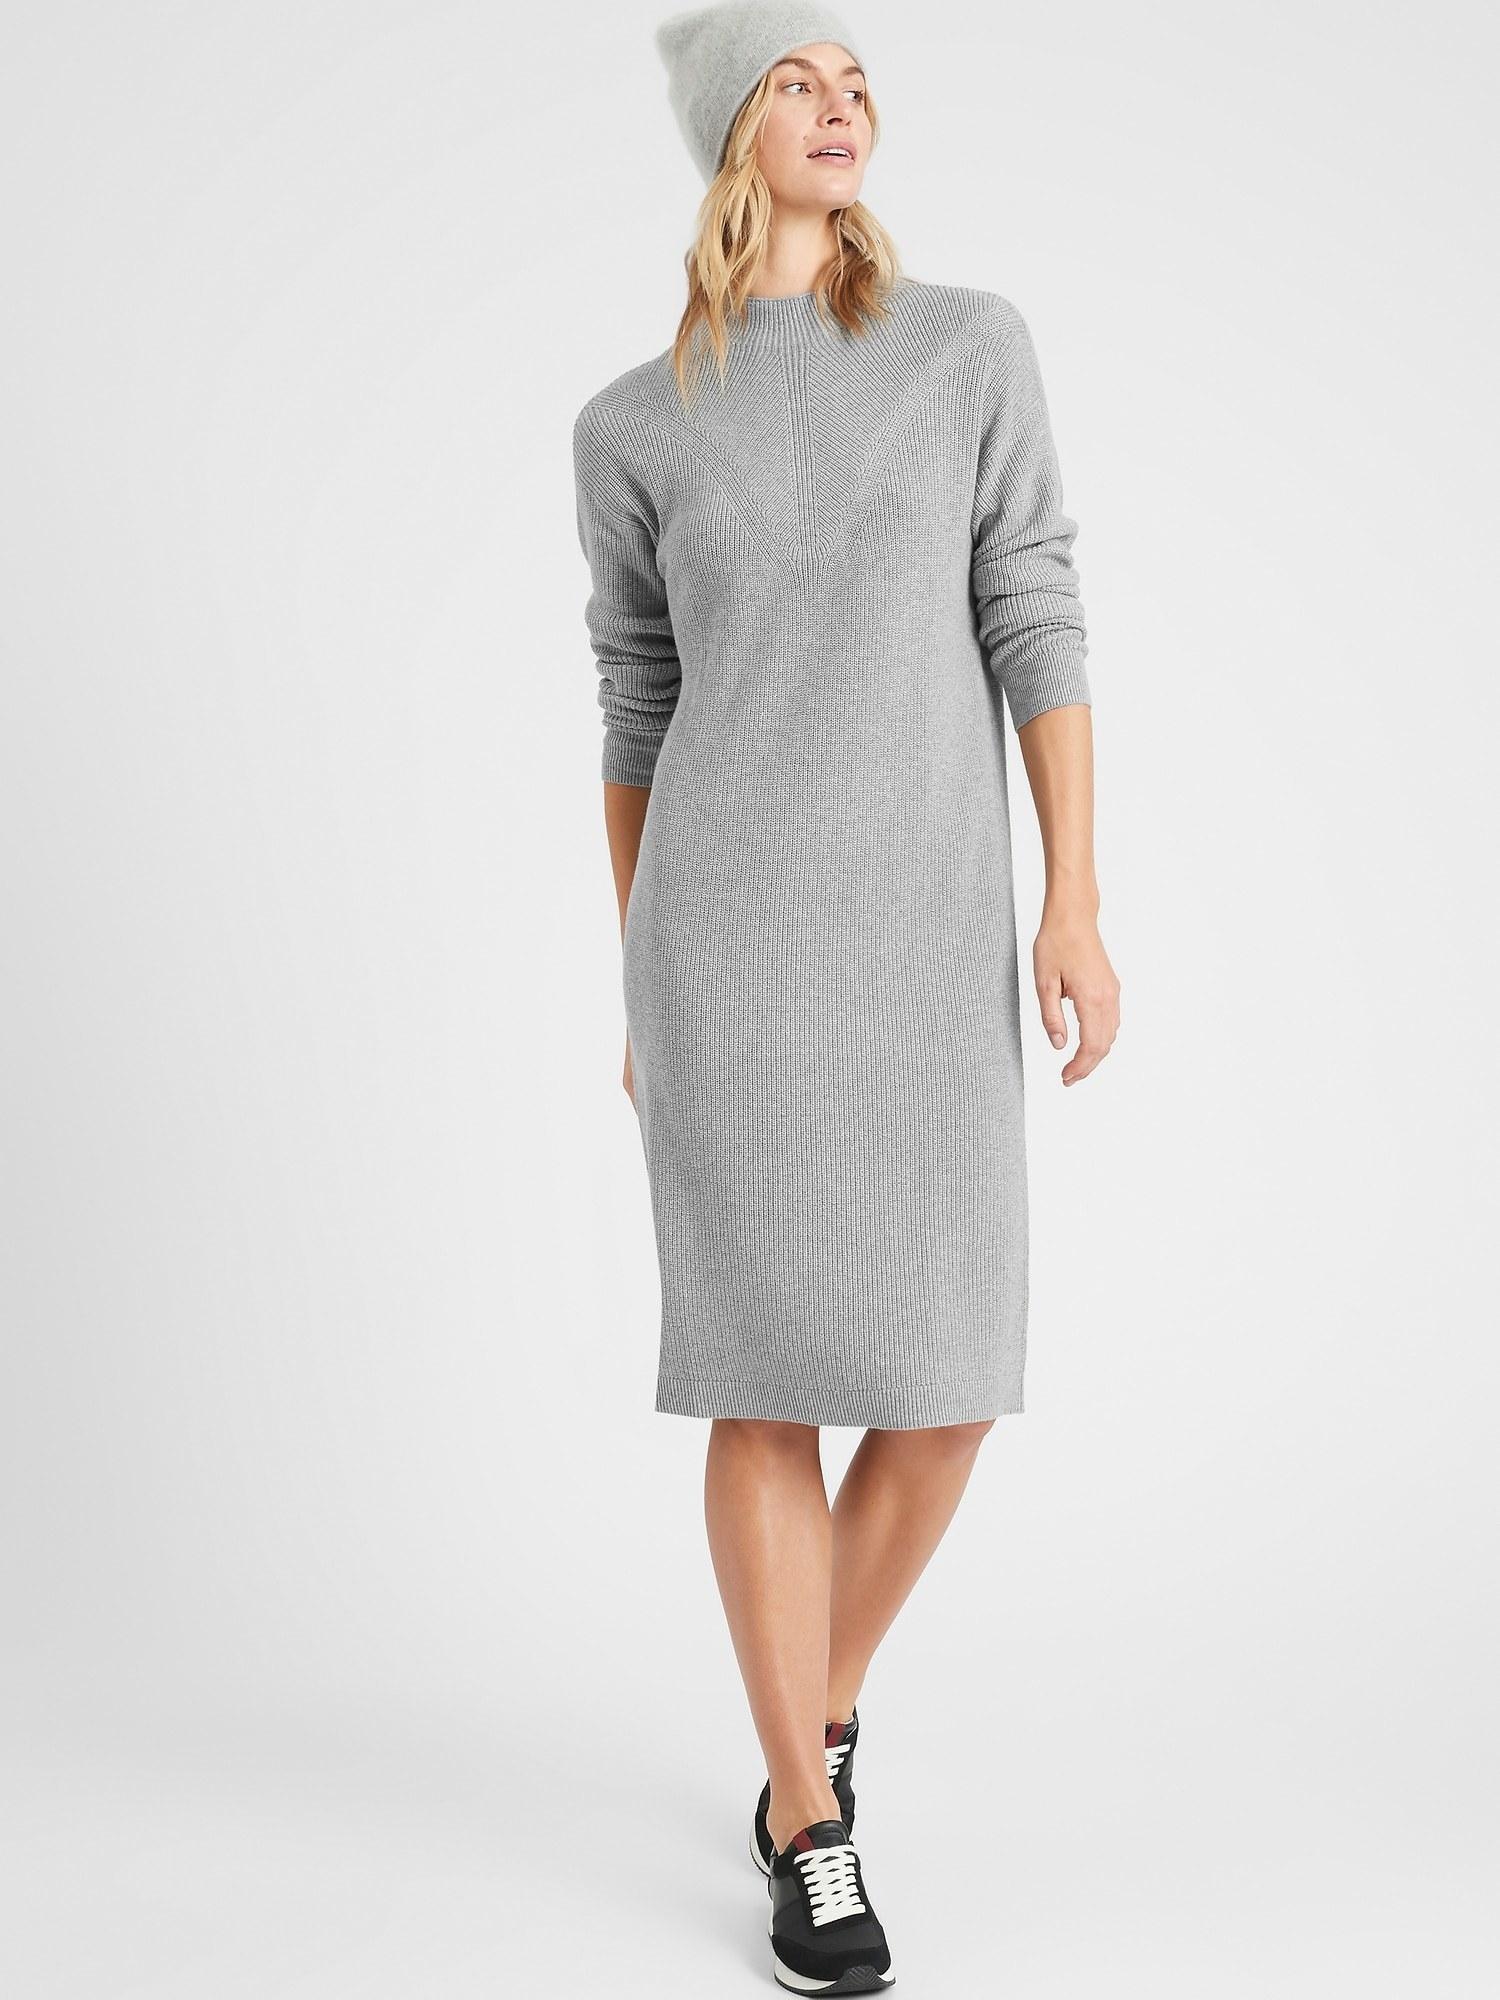 model wearing textured sweater dress in heather grey